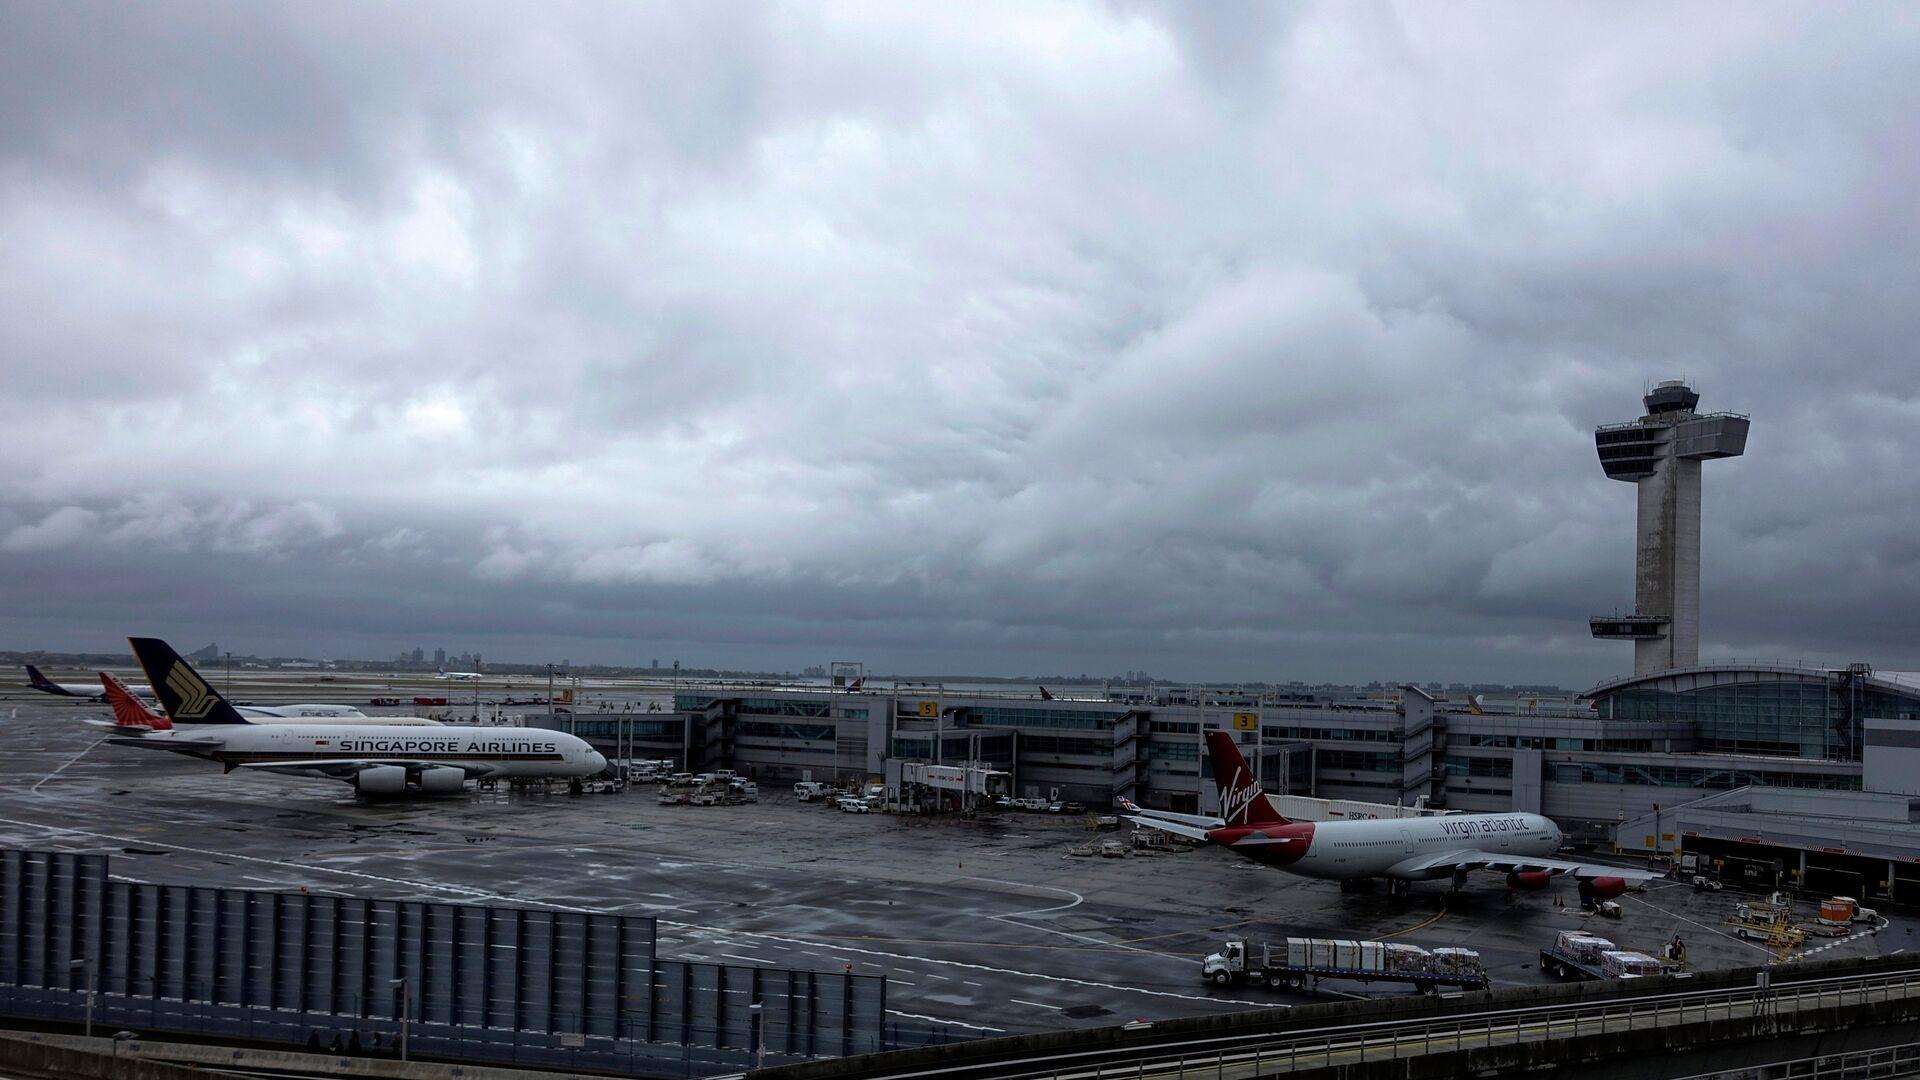 Una vista dell'aeroporto JFK a New York - Sputnik Italia, 1920, 05.08.2021